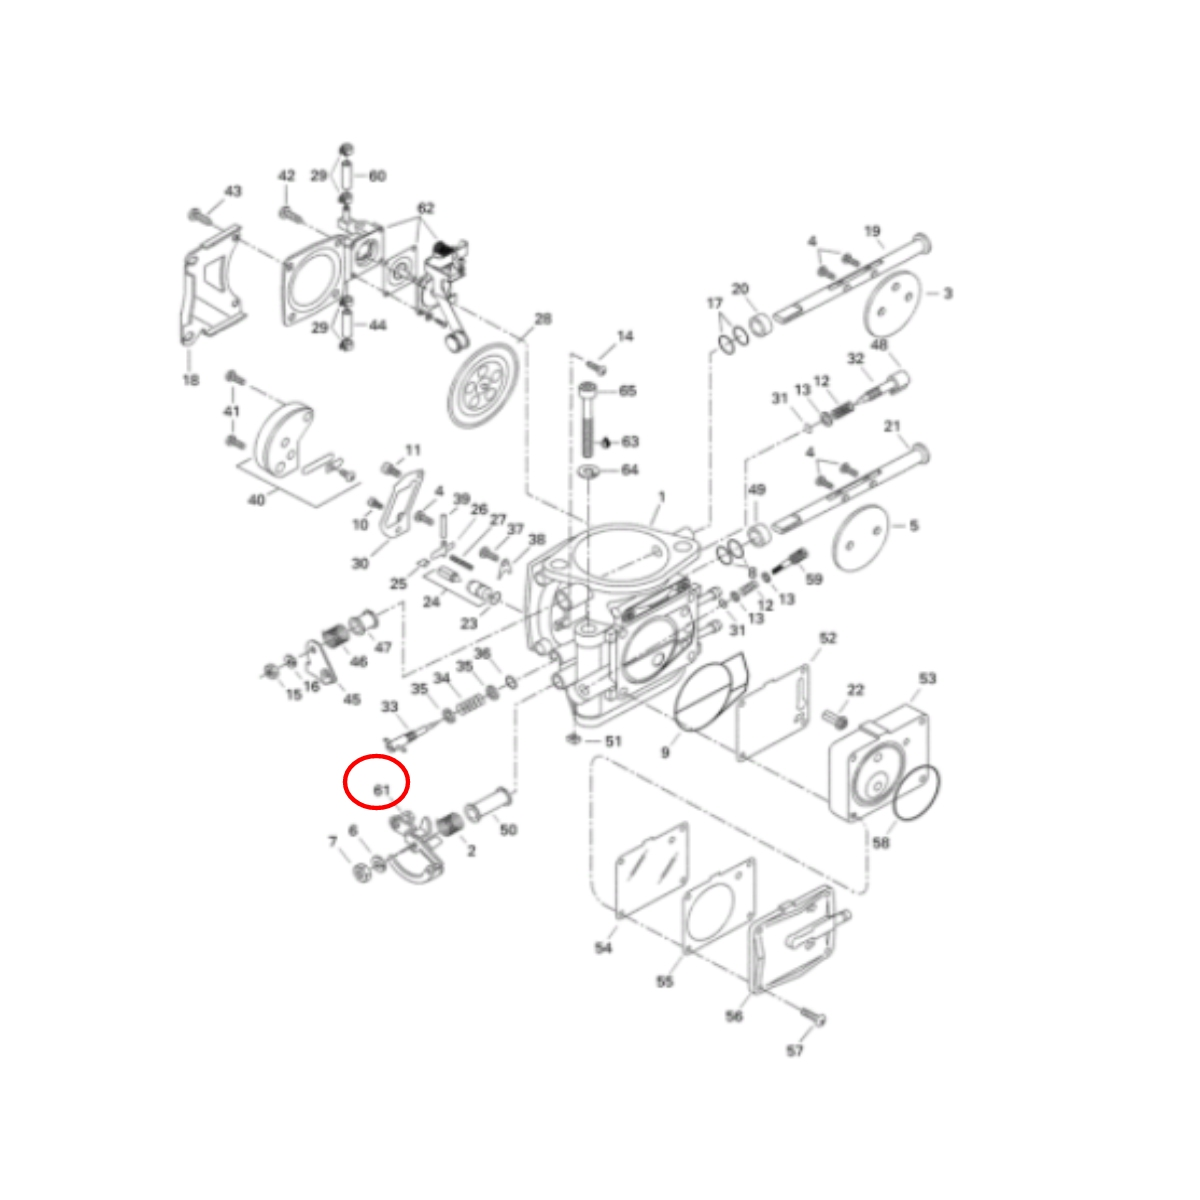 Alavanca Carburador para Jet Ski XP 96  - Radical Peças - Peças para Jet Ski